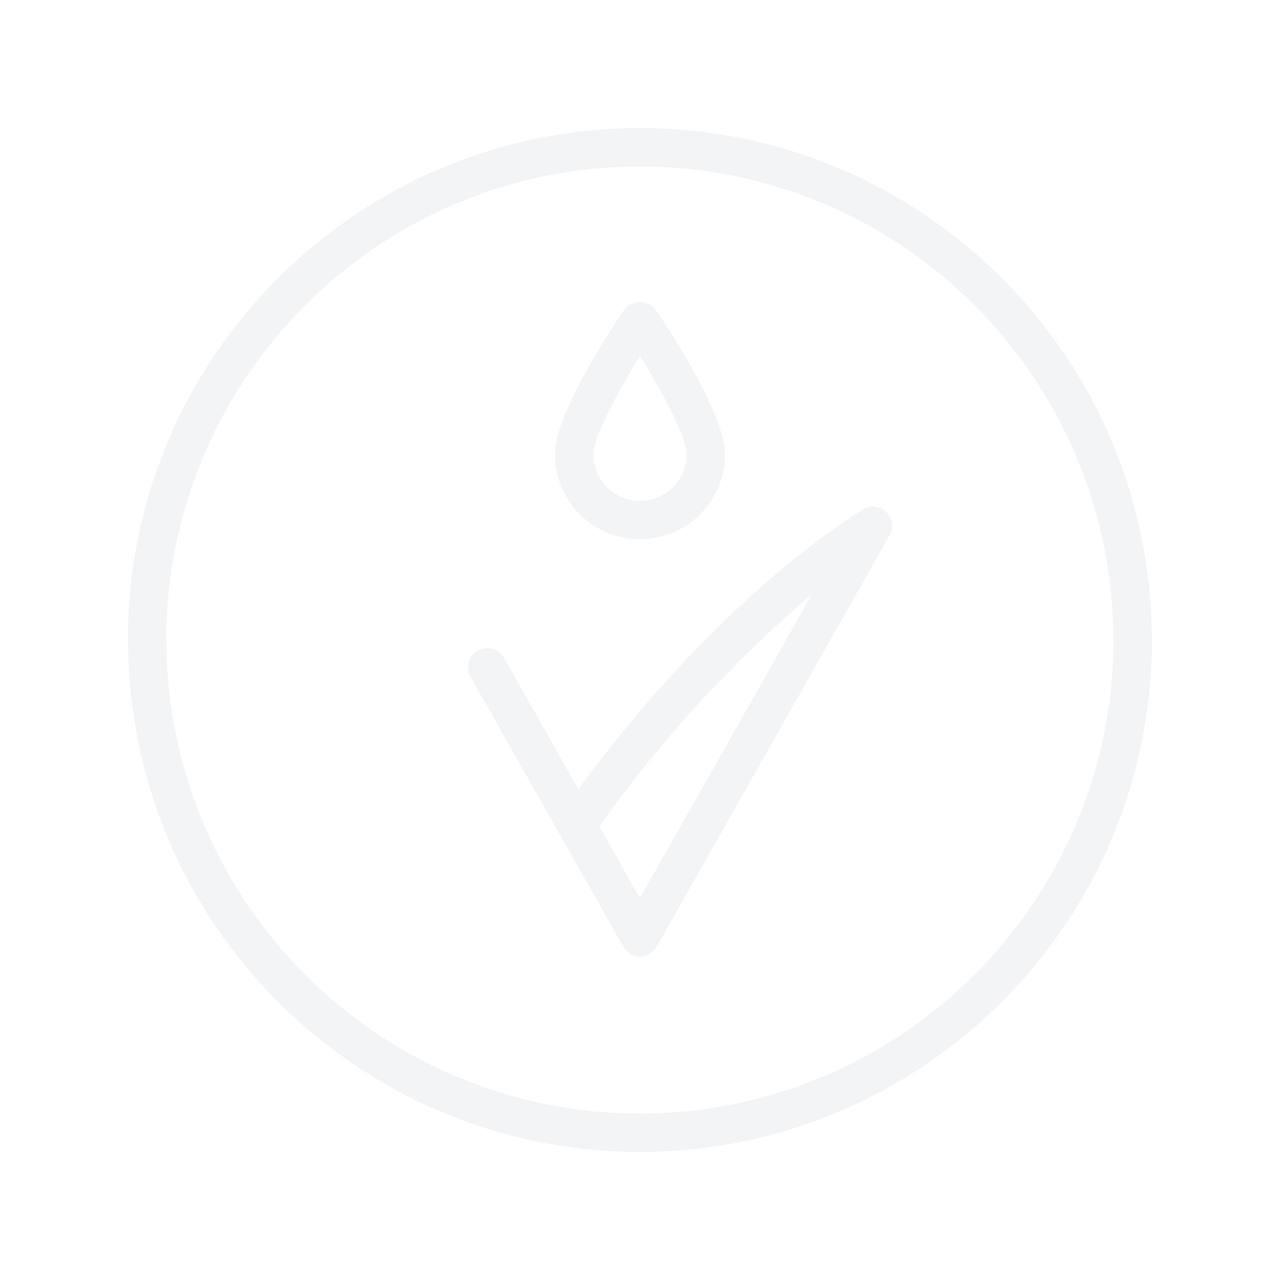 Dolce & Gabbana The One Men 100ml Eau De Toilette Gift Set